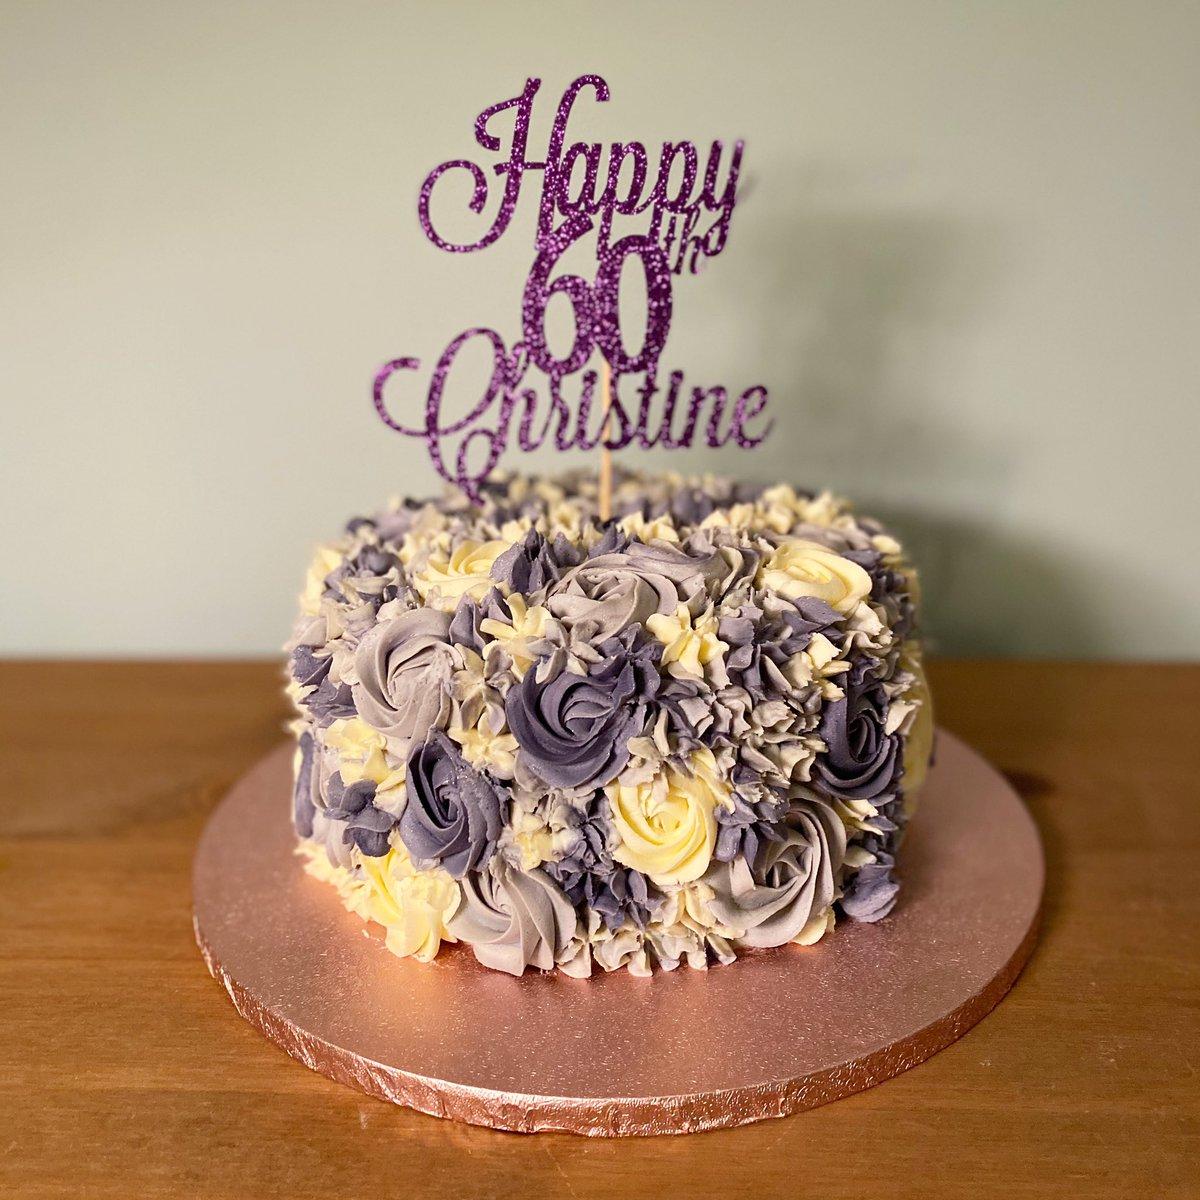 Cakes By Kinane On Twitter Happy 60th Birthday Christine Topper As Always Sunshineoccasions Cakesbykinane Birthdaycake